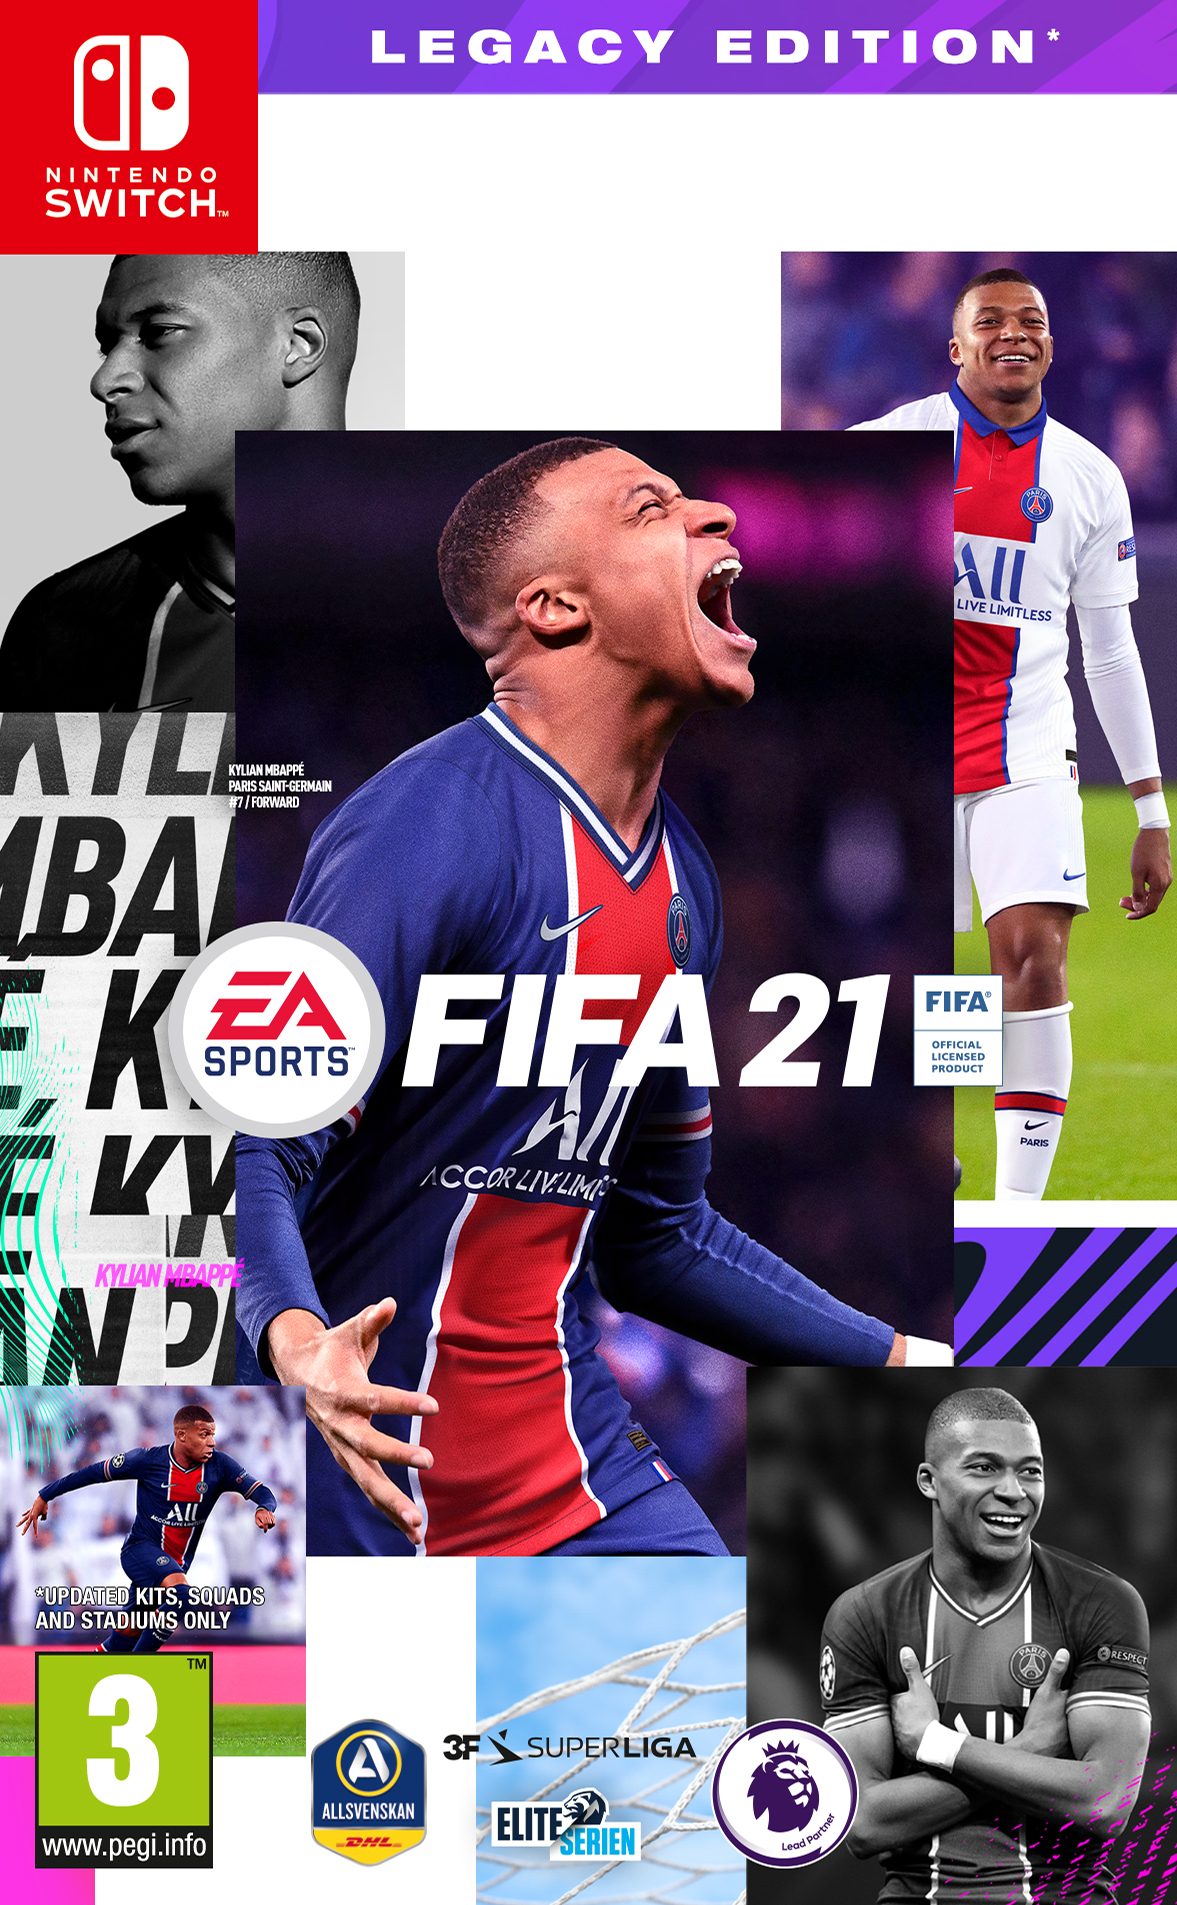 coolshop.co.uk - FIFA 21 (Nordic) Legacy Edition